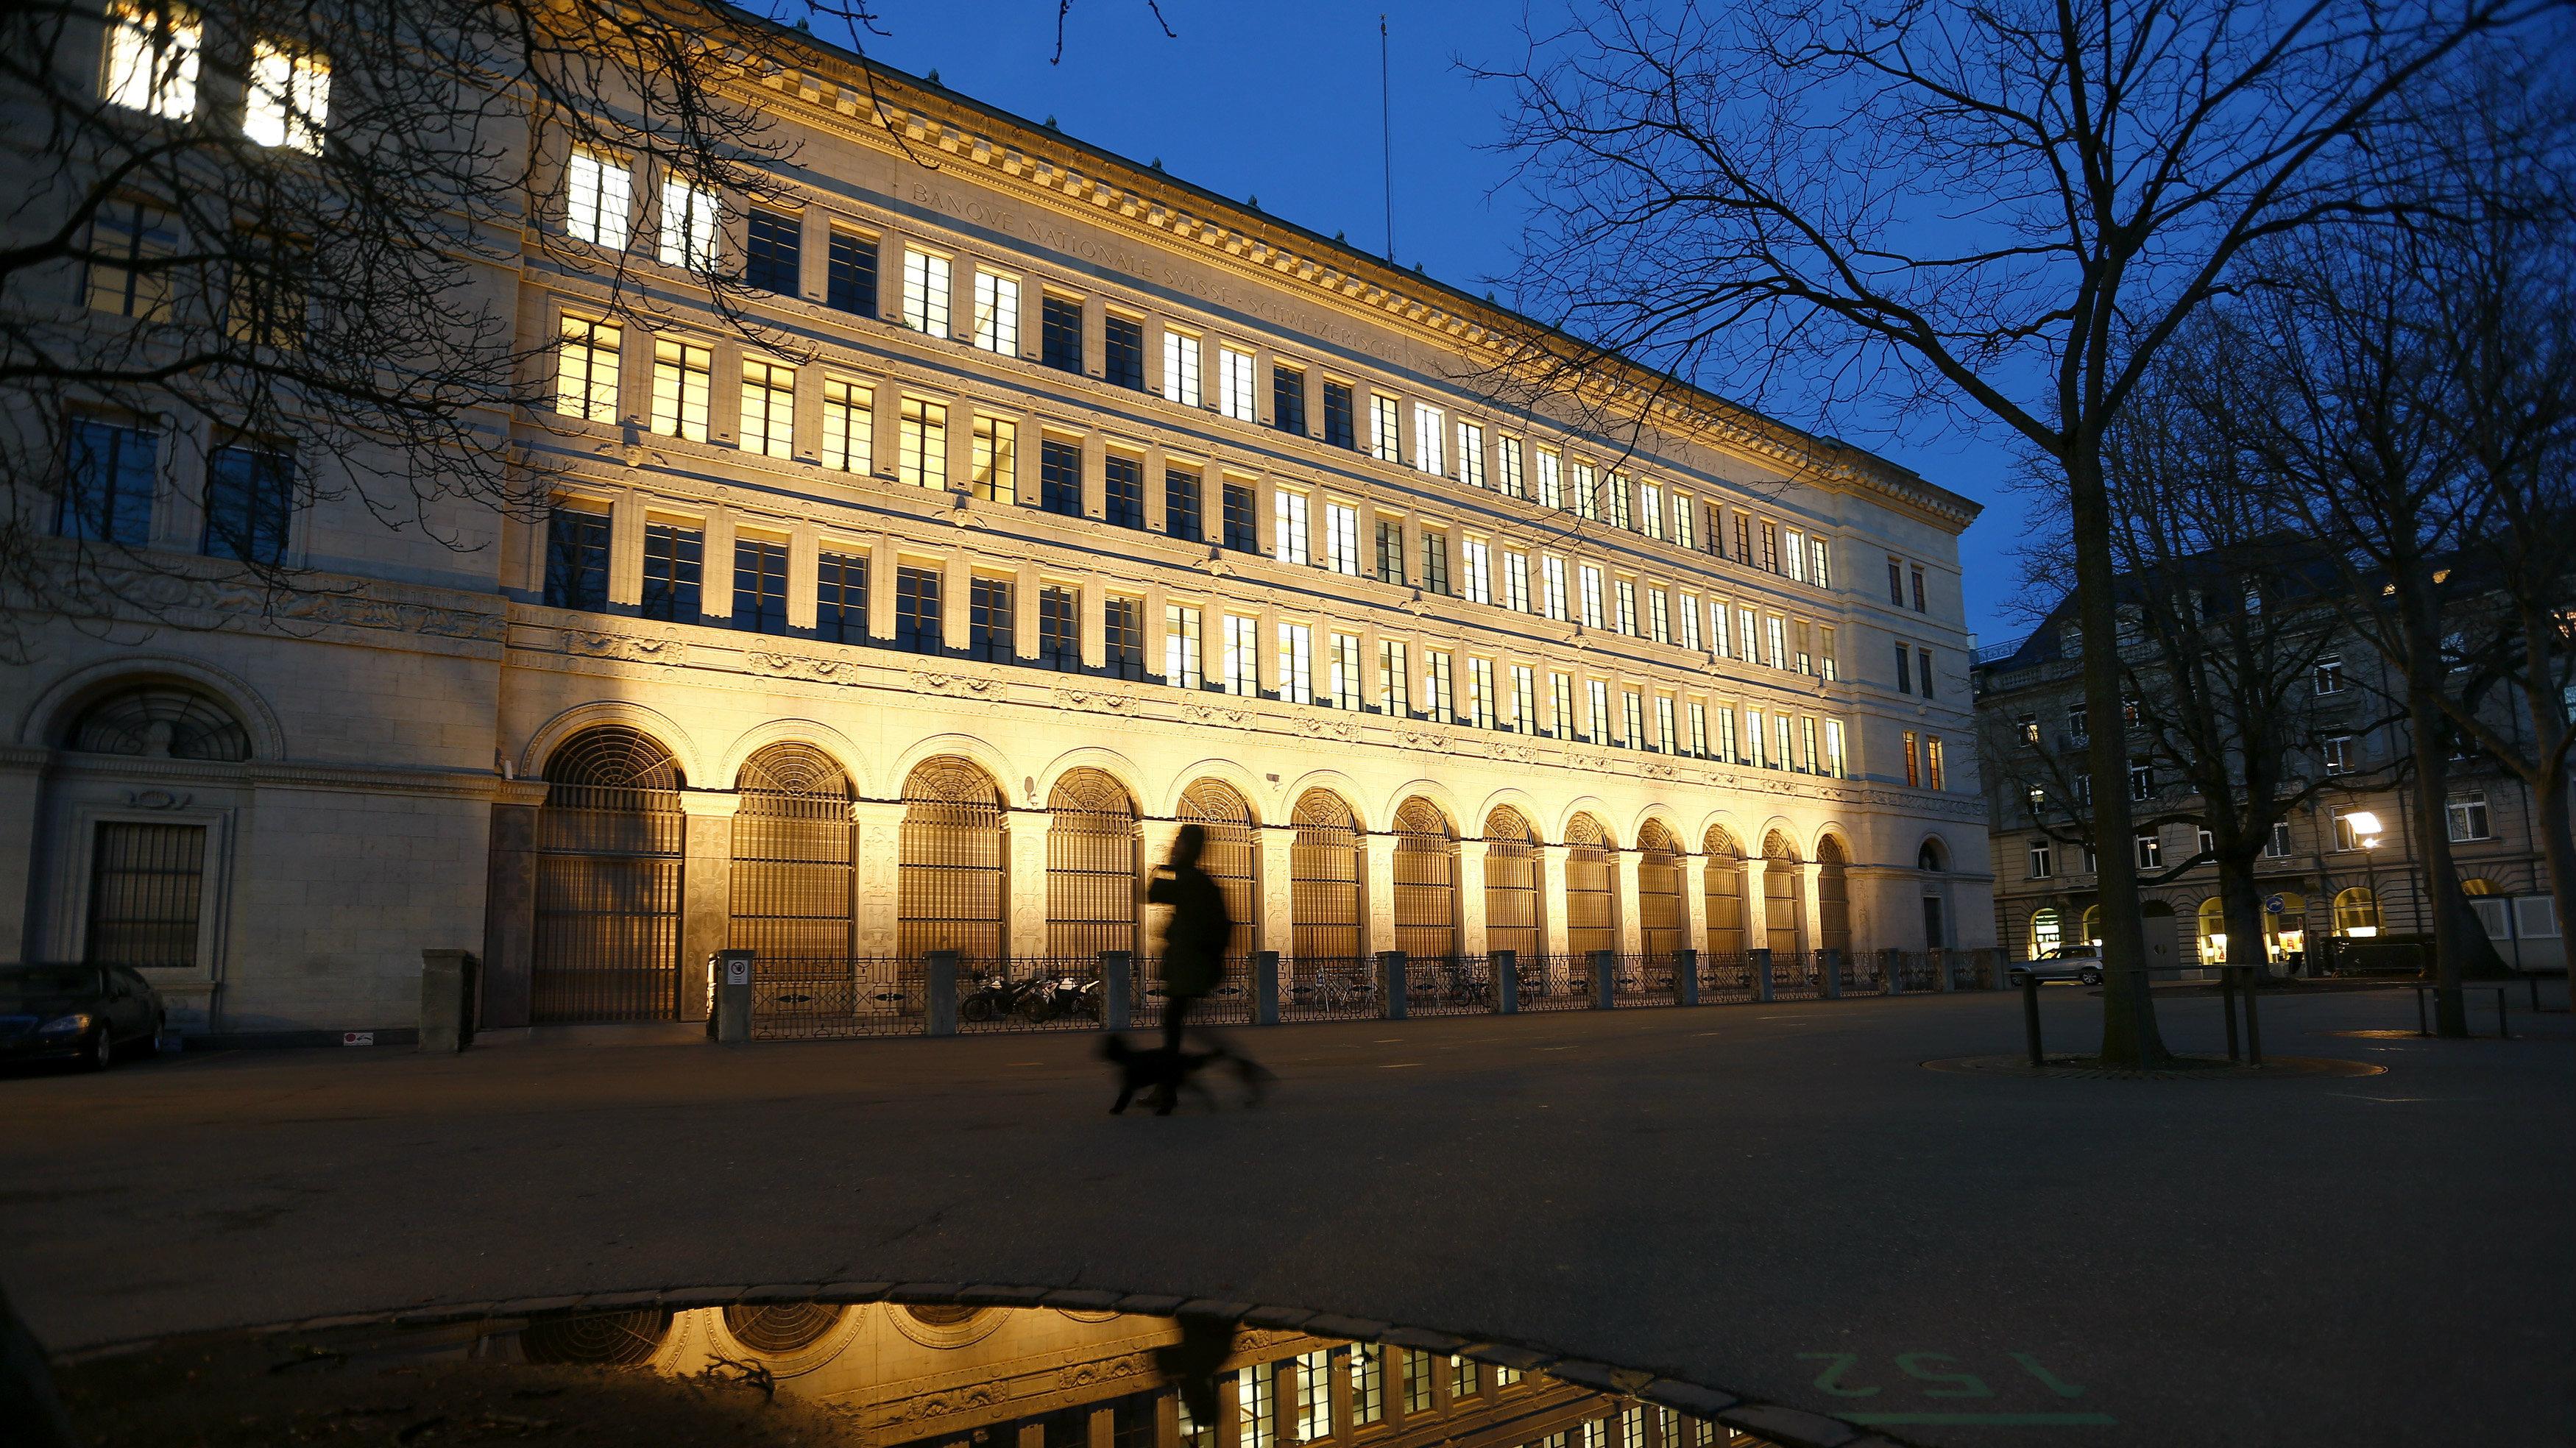 Swiss National Bank building